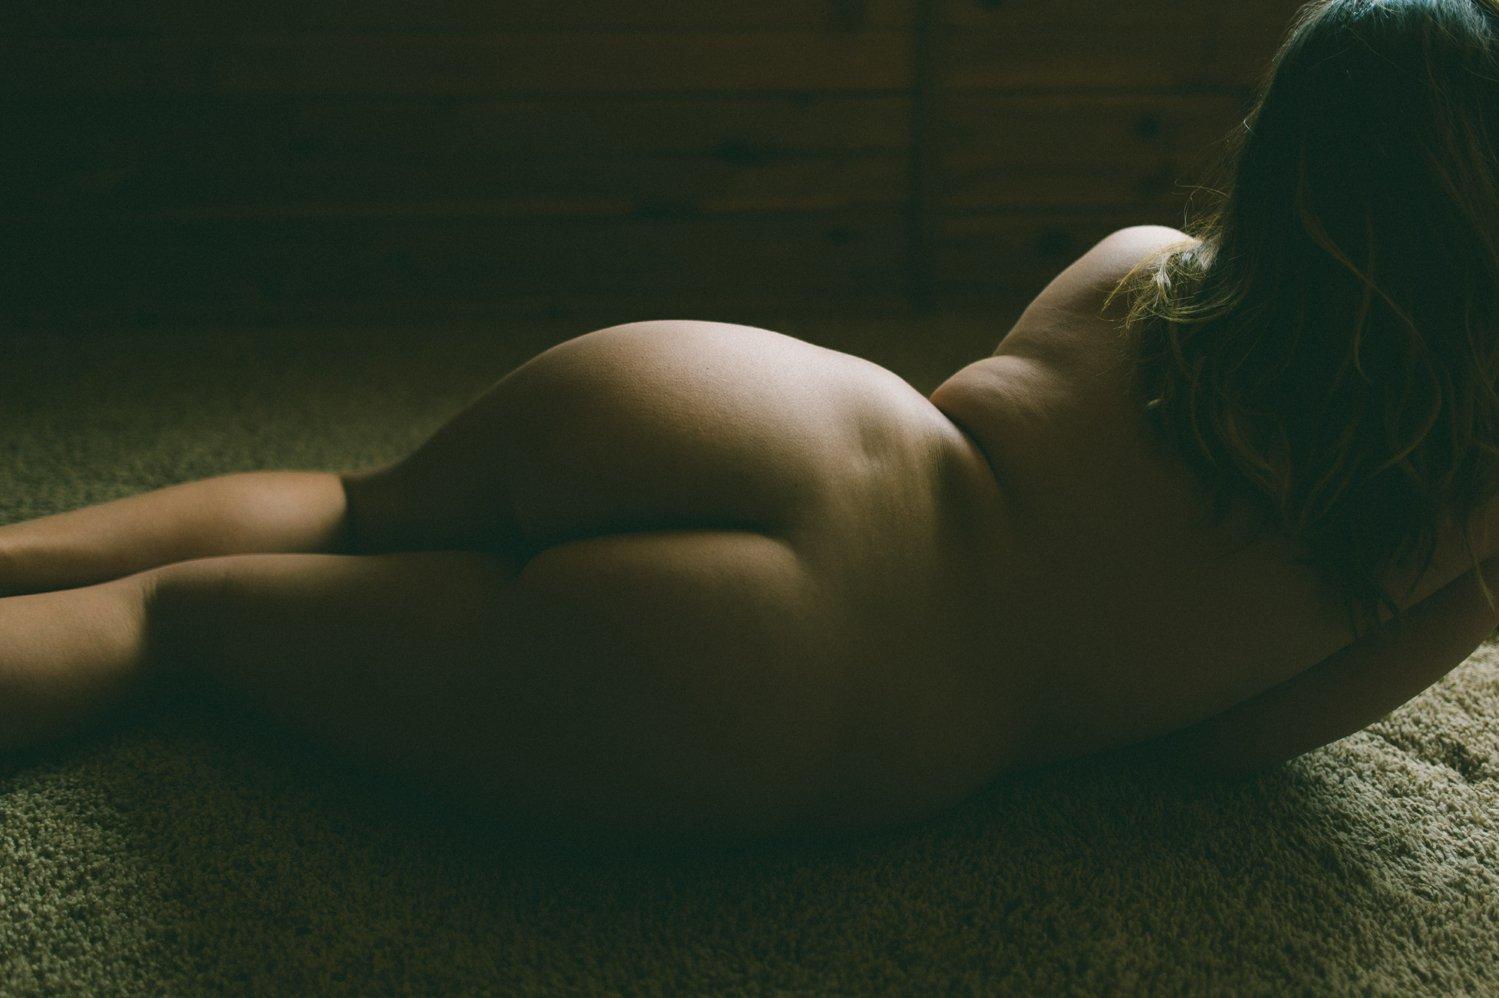 Natural curves life model fine art nude - creative London boudoir photographer - alternative boudoir photography London © Babb Photo